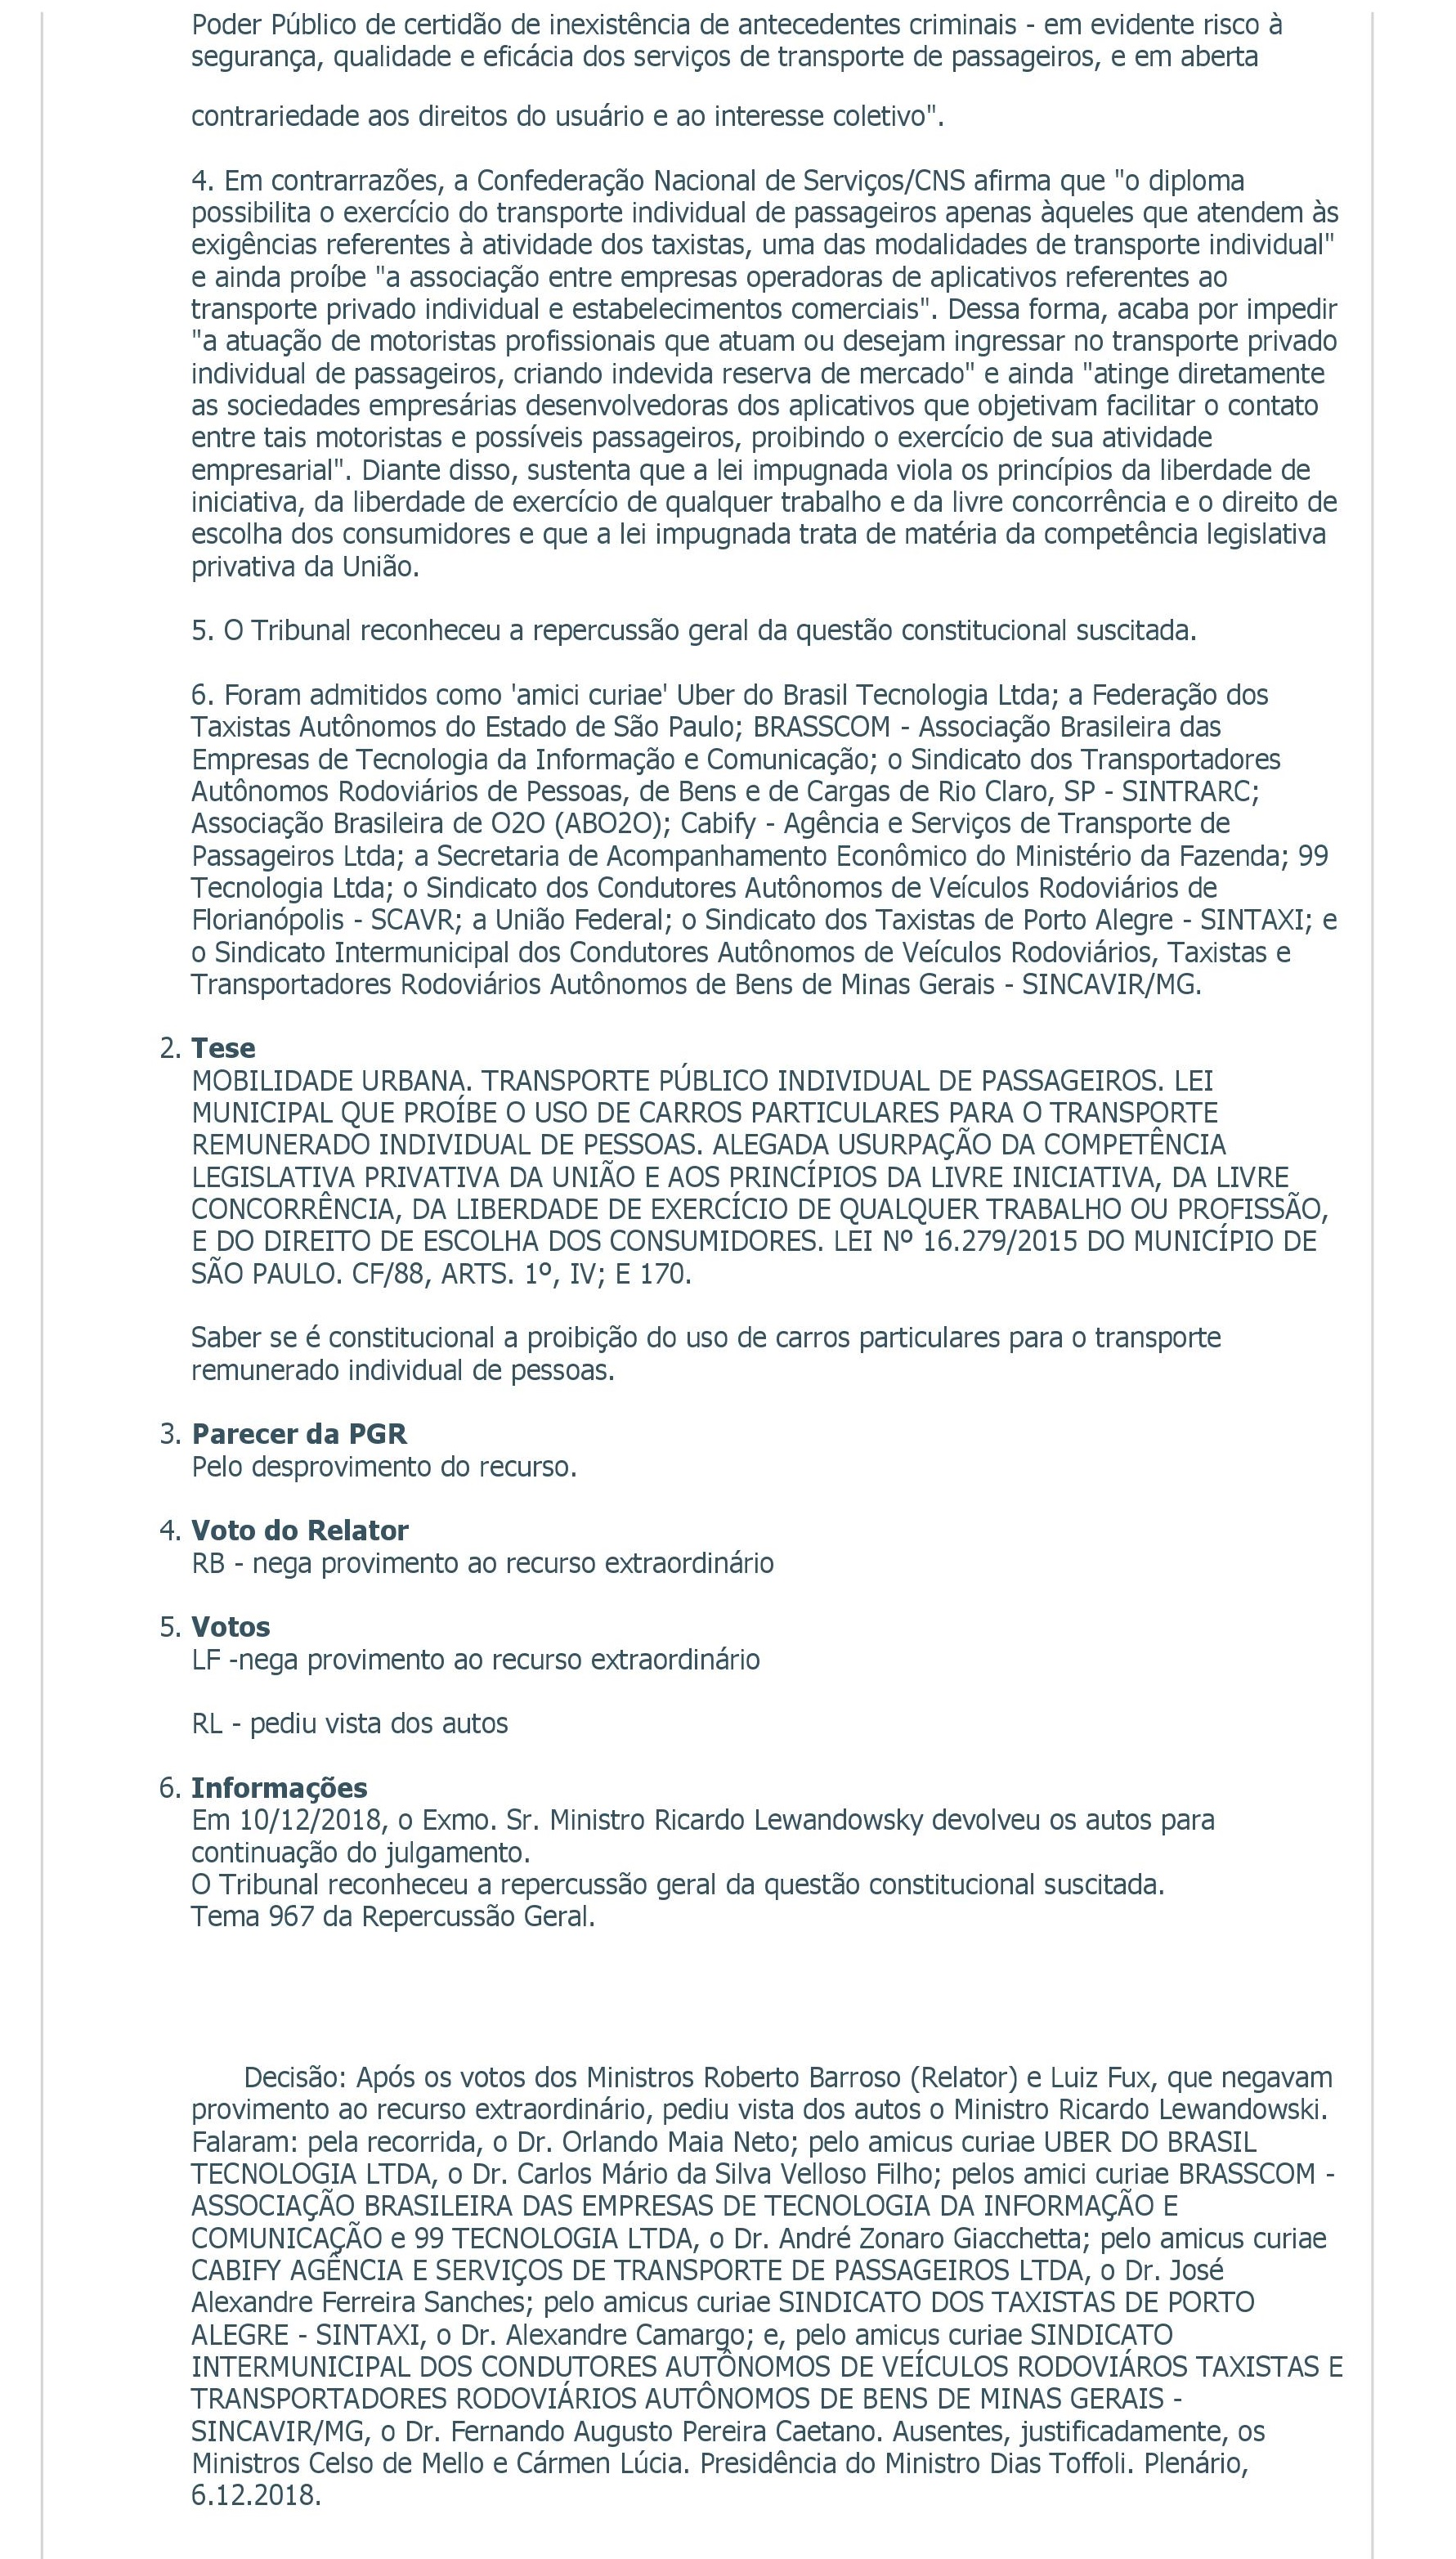 pauta_julgamento_STF_b_02